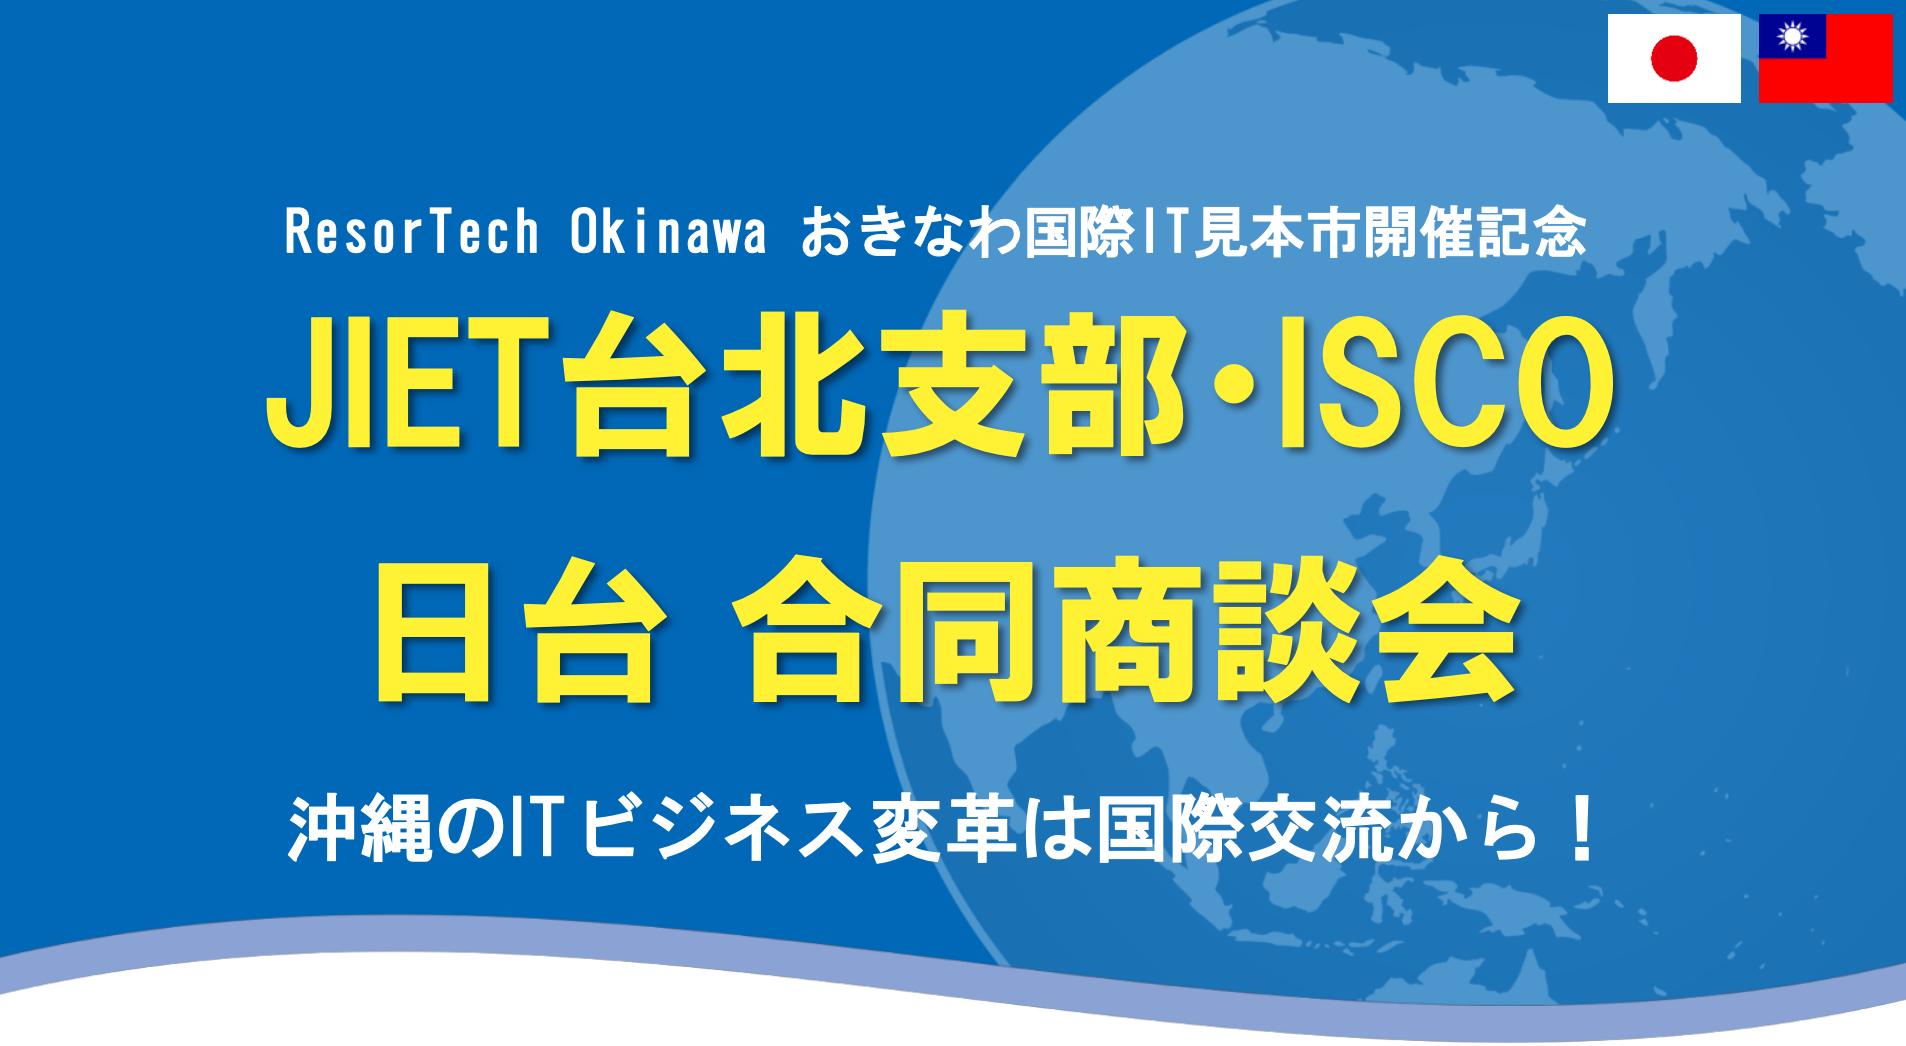 JIET 台北支部・ISCO 日台 合同商談会